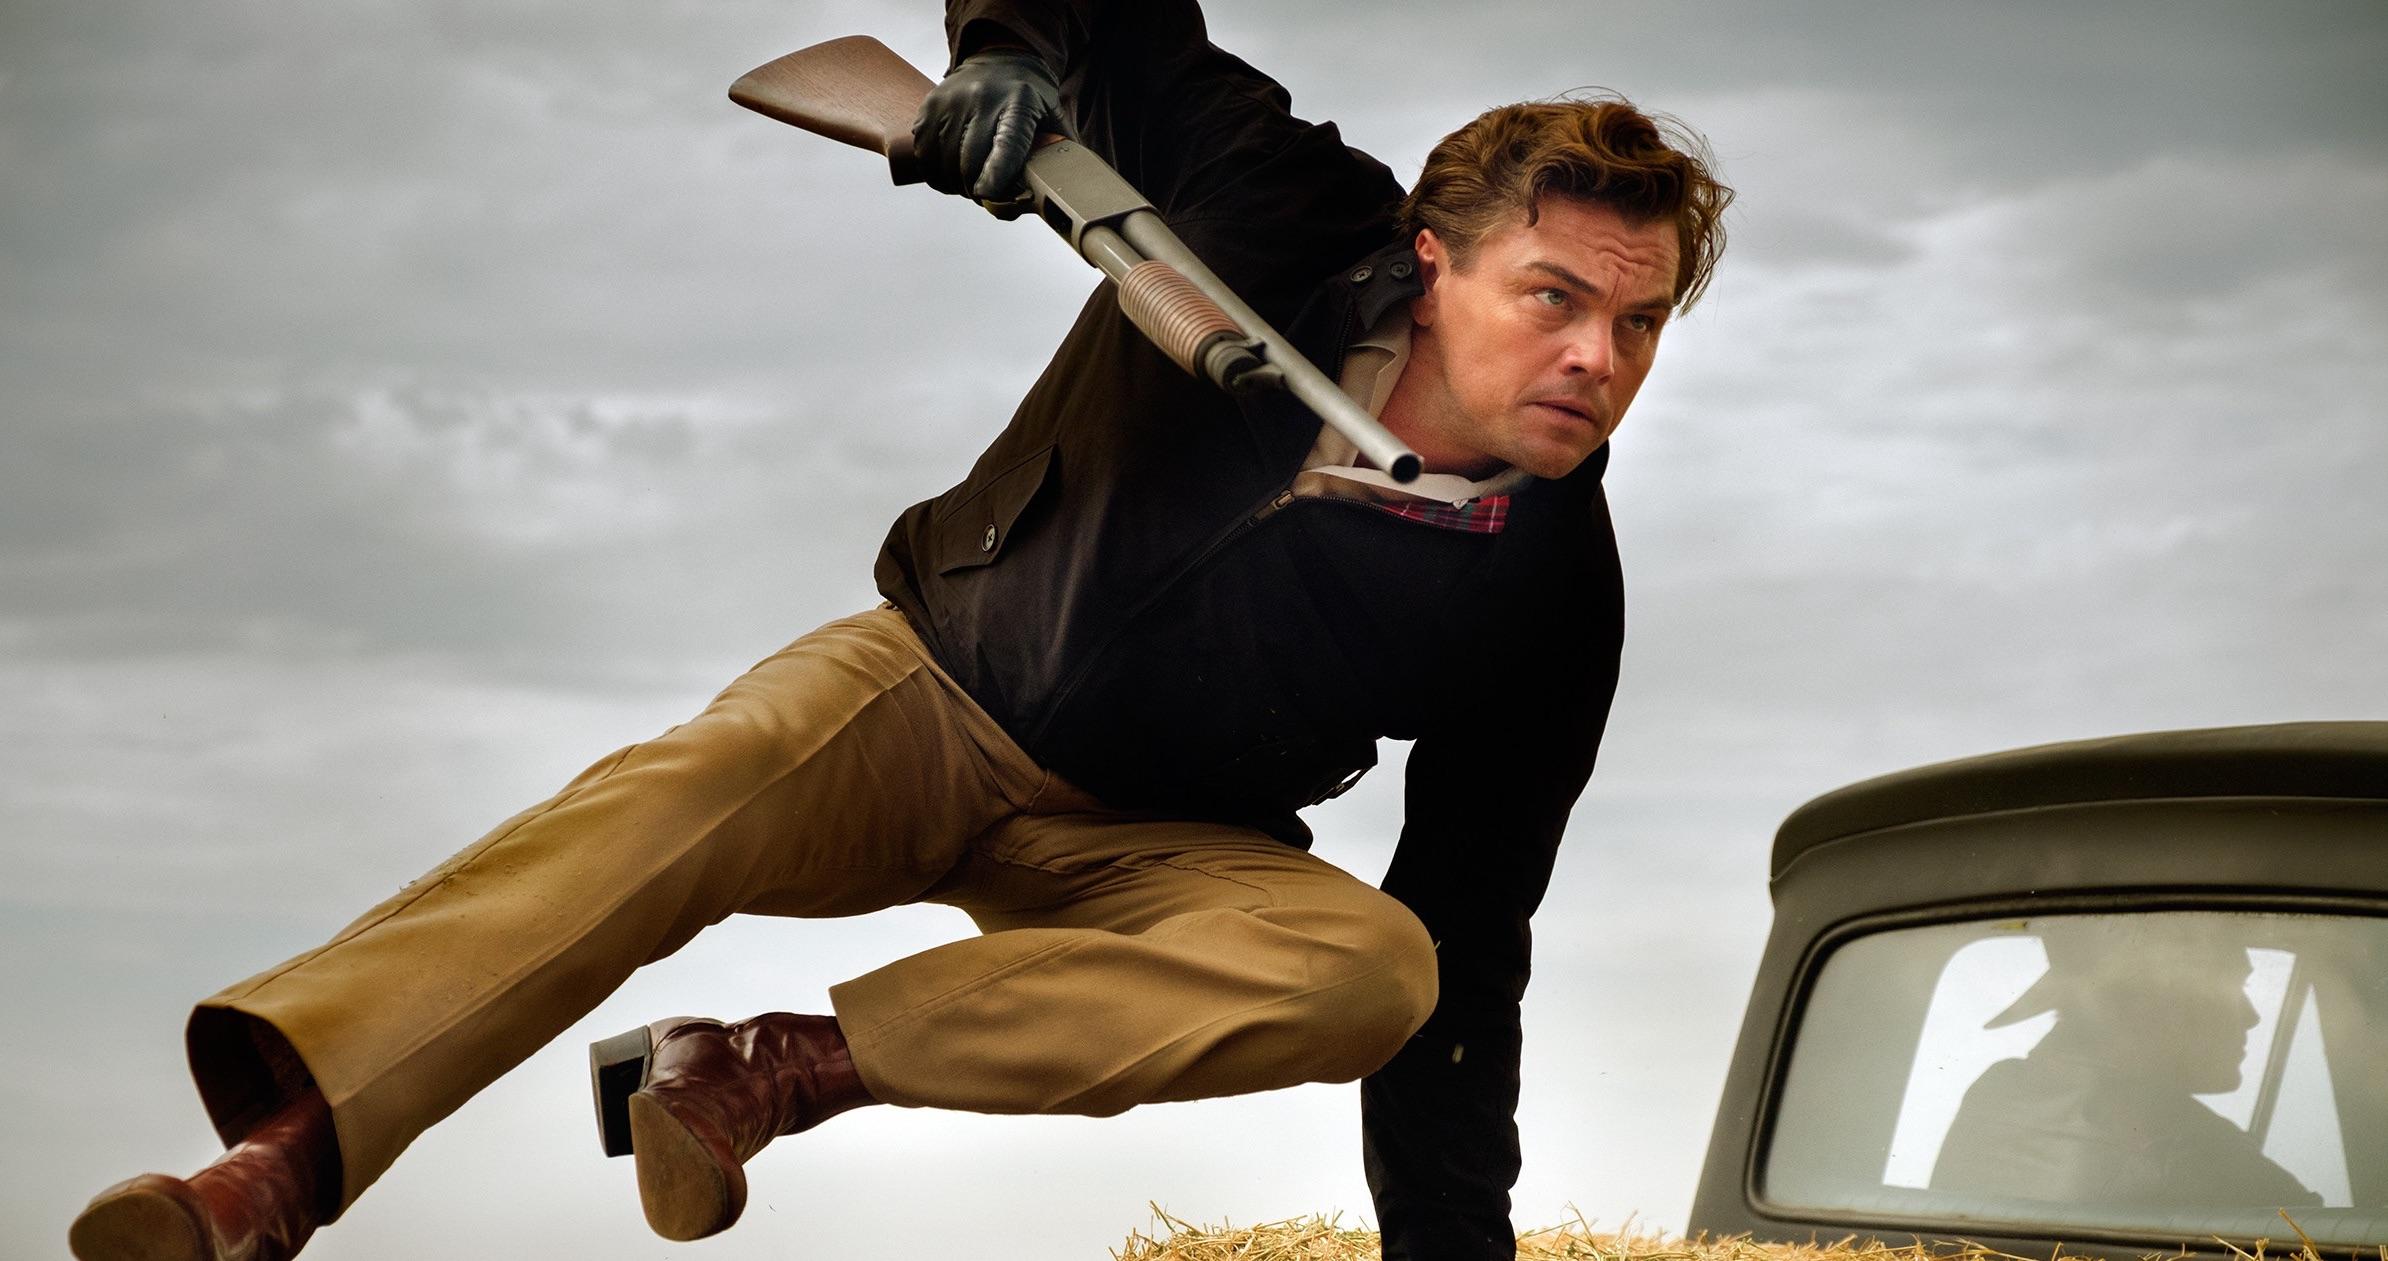 Upcoming Leonardo Dicaprio New Movies Tv Show 2019 2020,Lockscreen Black And White Wallpaper Tumblr